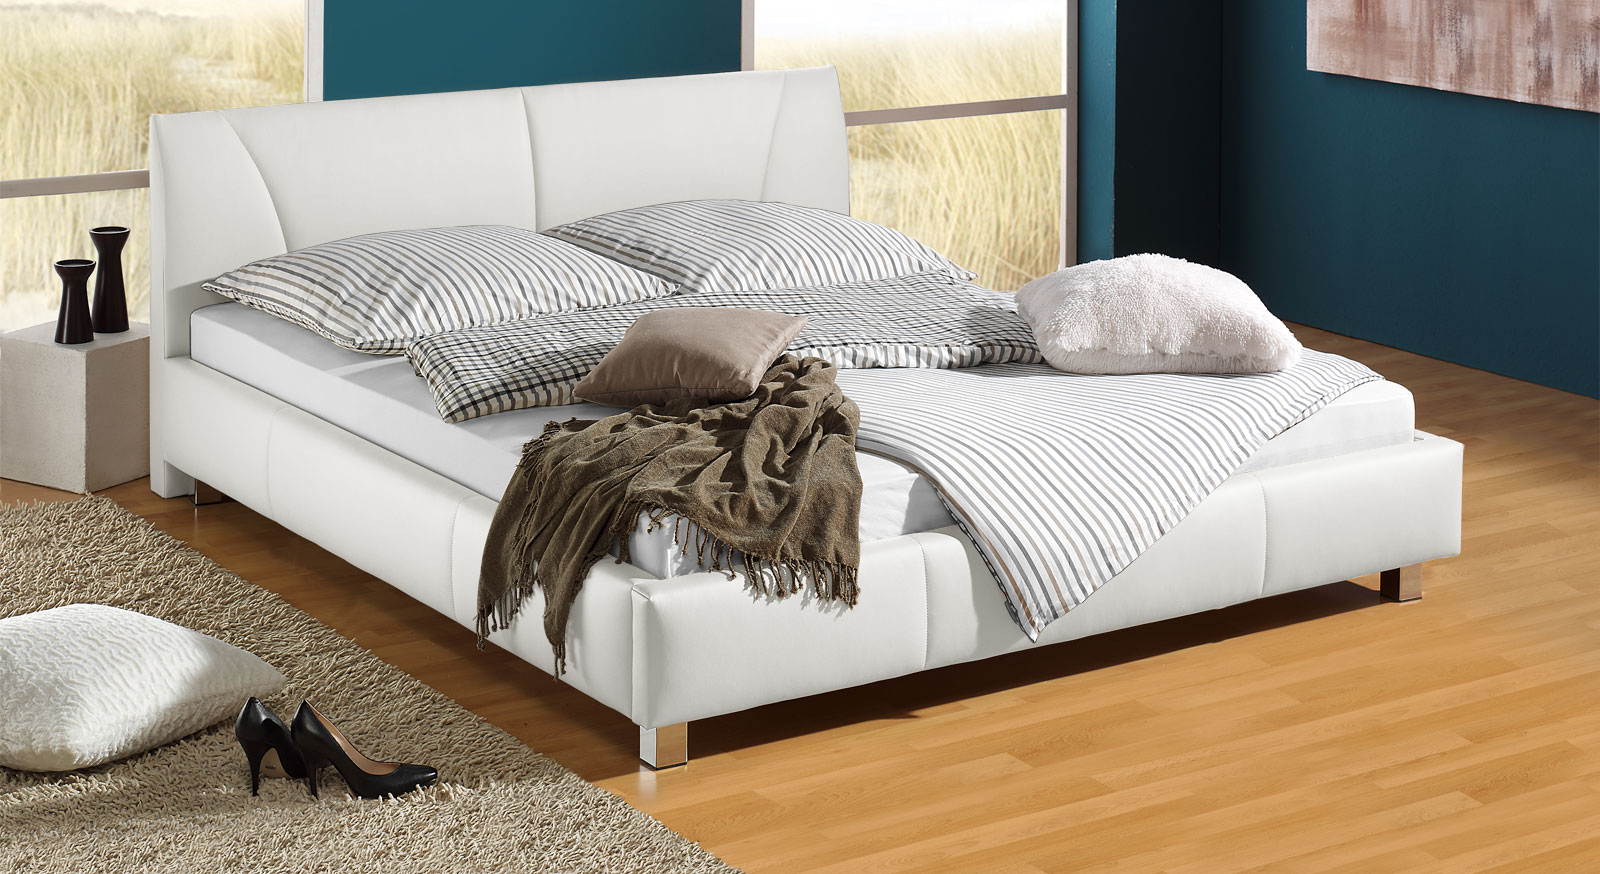 Full Size of Polsterbett 200x220 Gnstiges Z B In Wei 140x200 Cm Sona Bett Betten Wohnzimmer Polsterbett 200x220